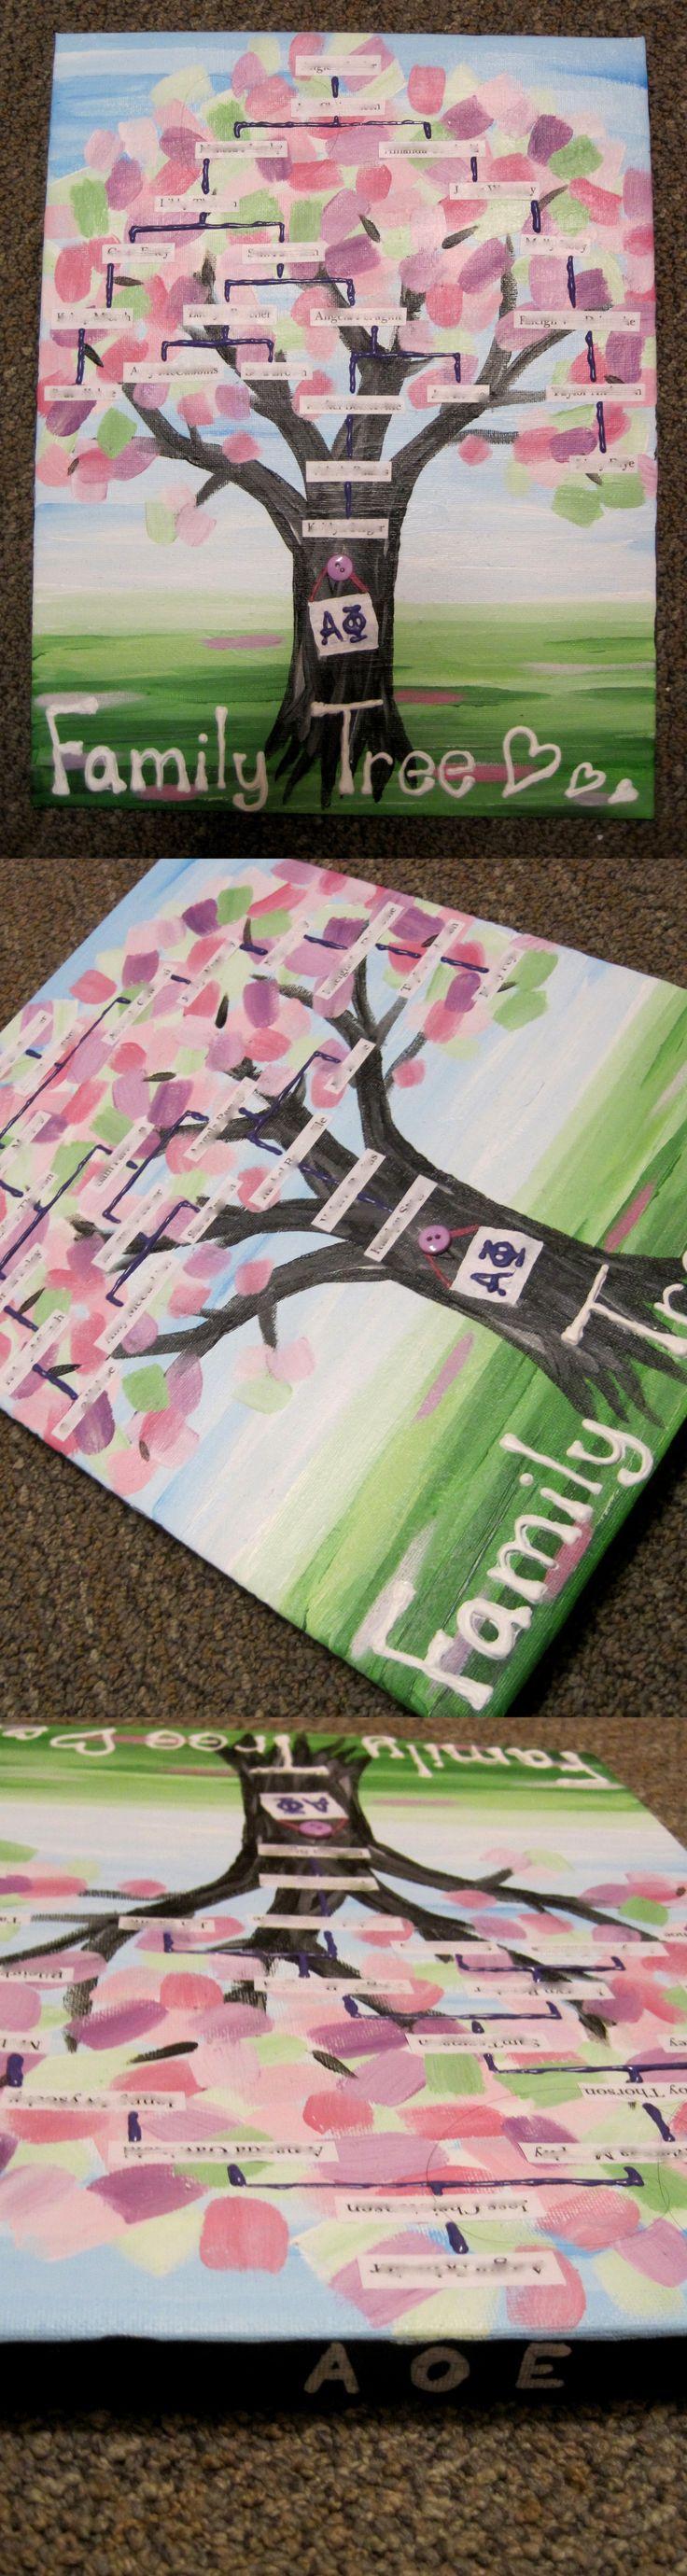 painted family tree! super cute idea! #sorority #crafts  #familytree